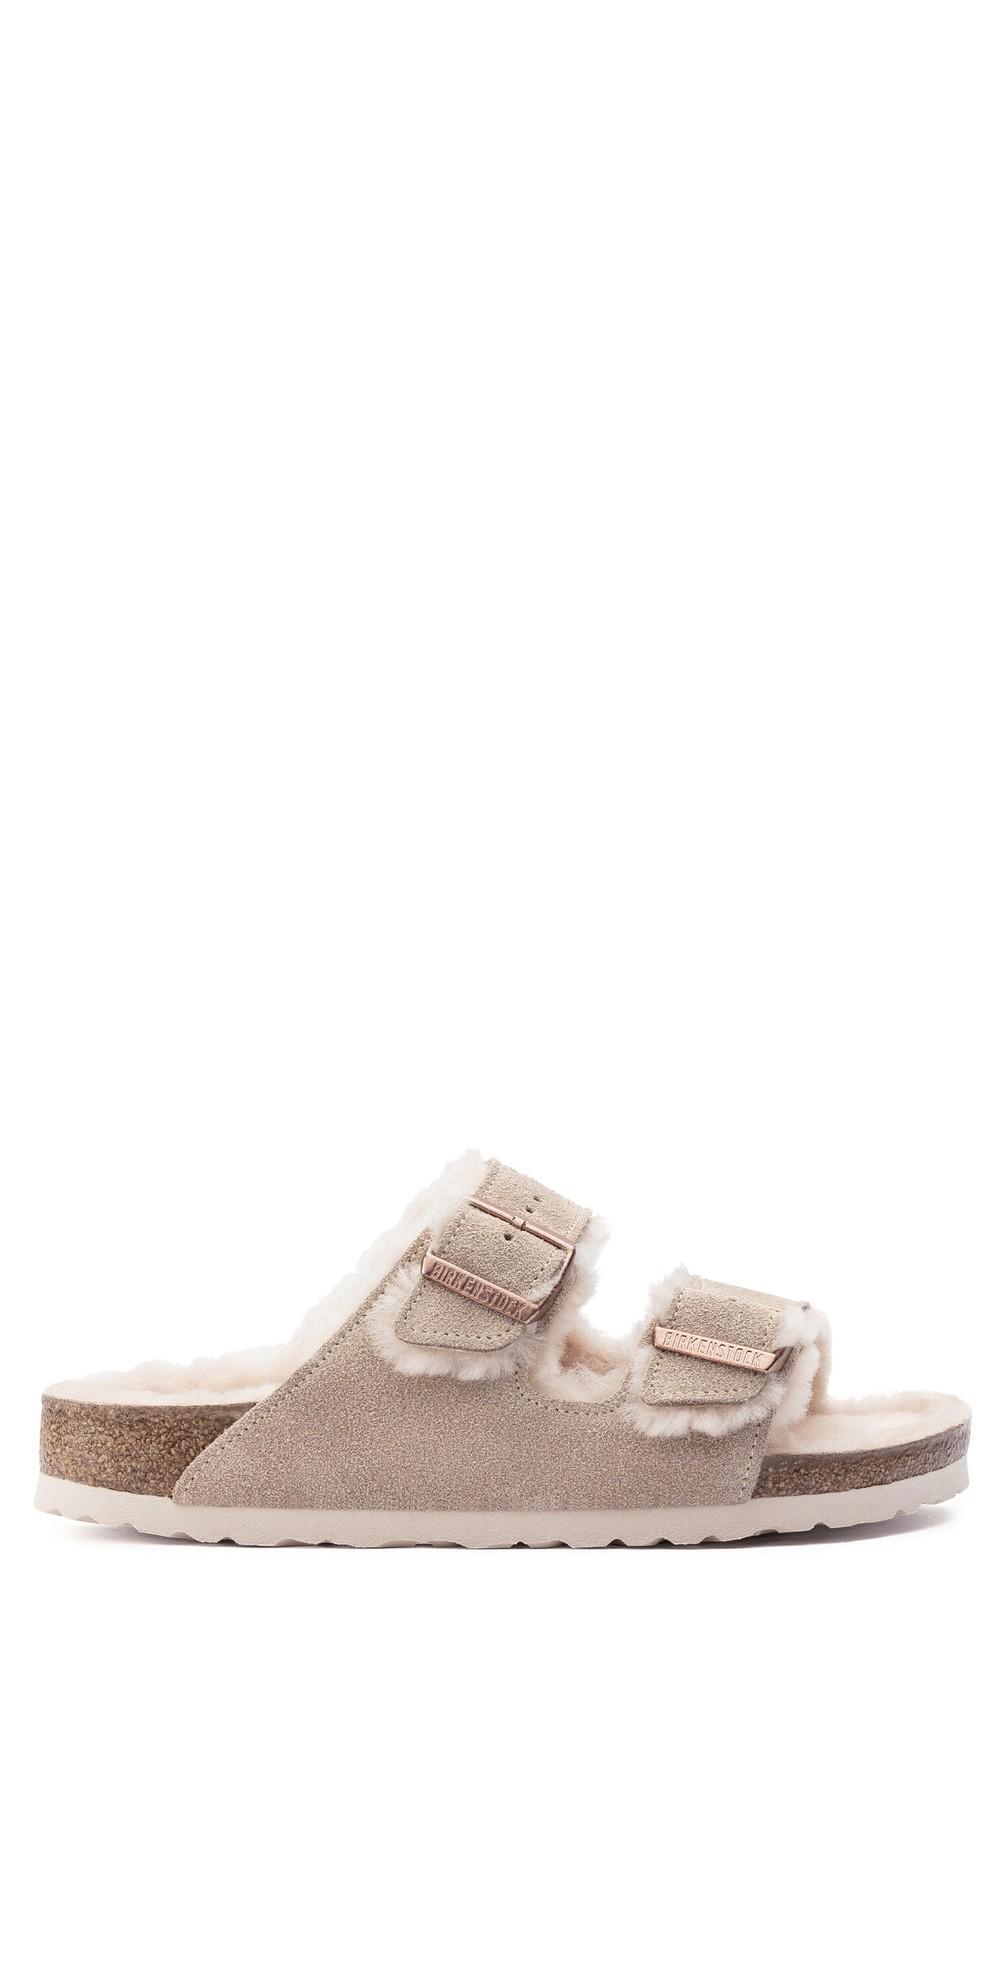 Arizona Shearling Classic Sandal Slipper  main image